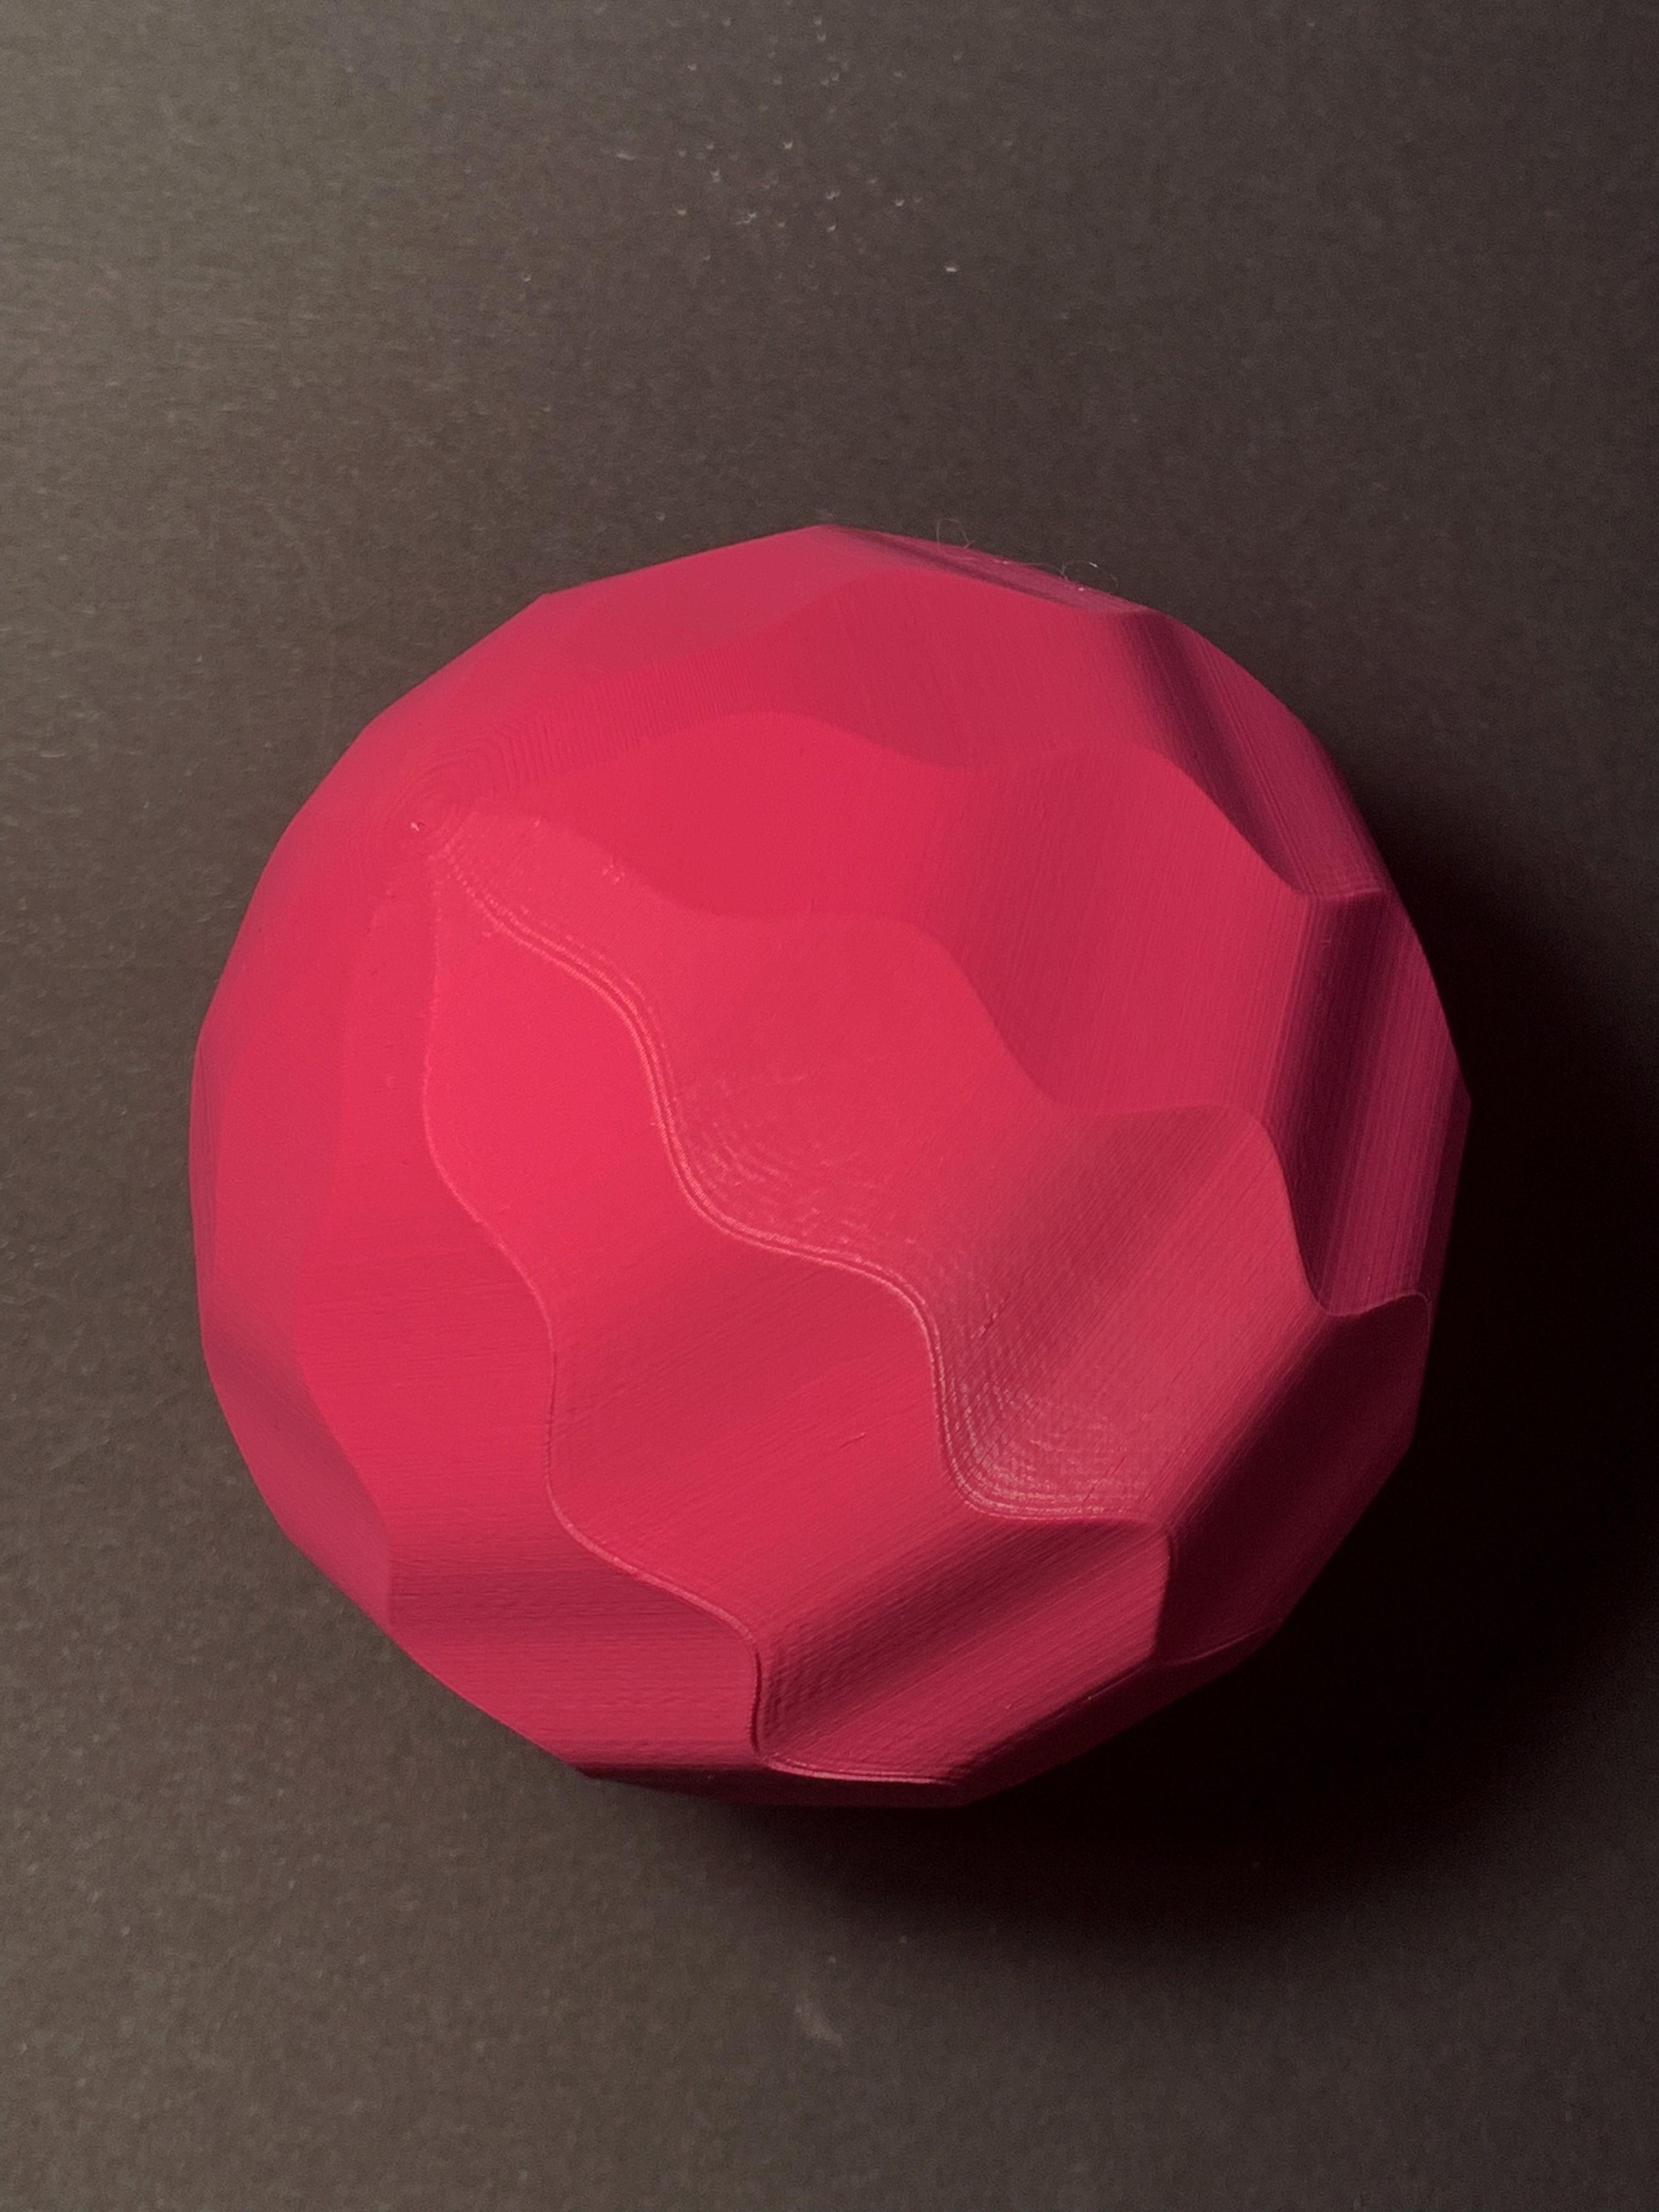 IMG_4393.jpg Download STL file wave sphere • Template to 3D print, Ciokobango